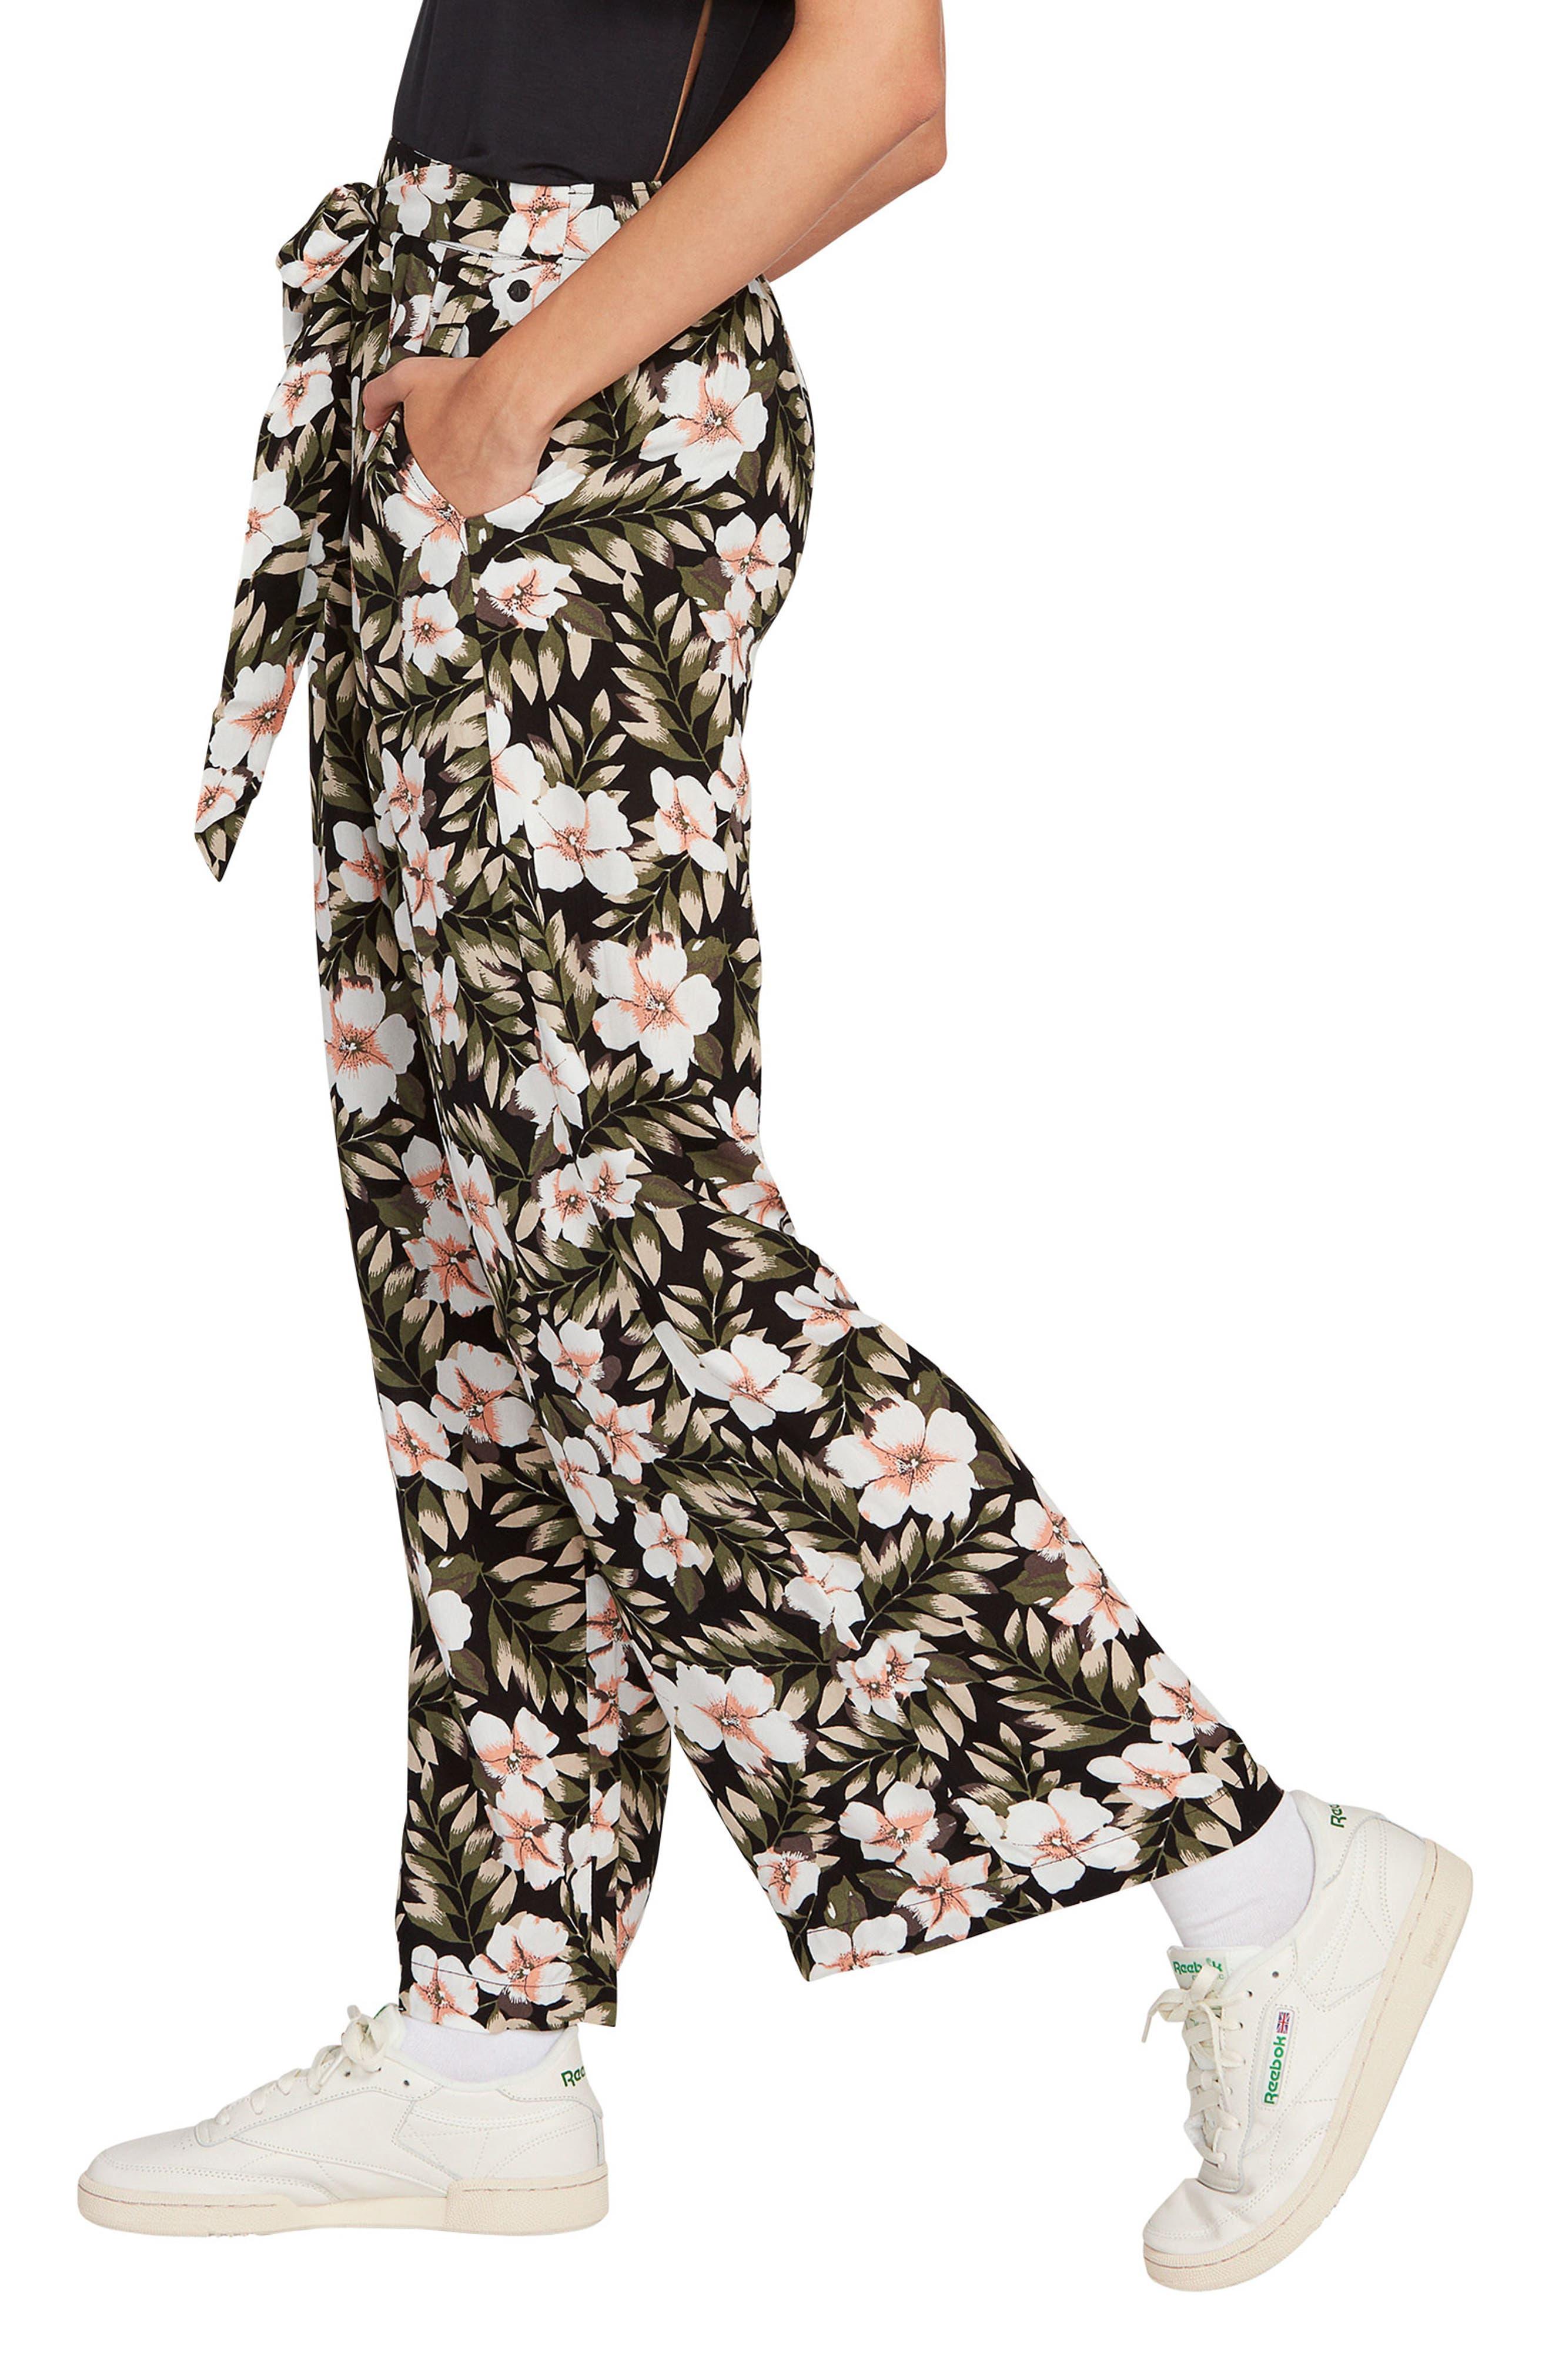 Volcom   x Coco Ho Belted Wide Leg Pants   Nordstrom Rack